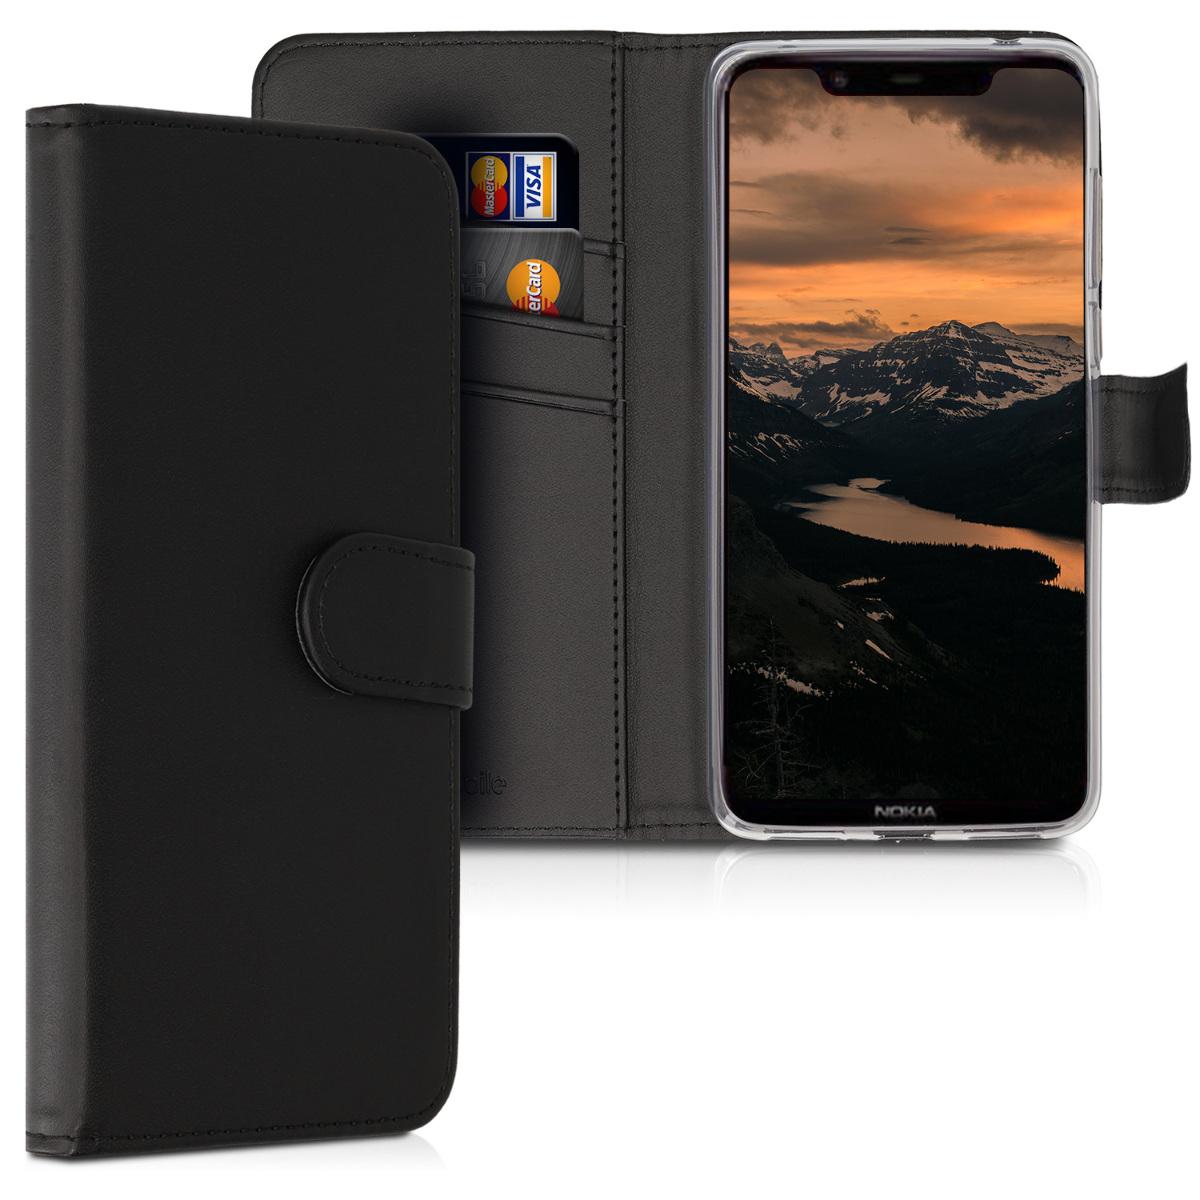 KW Θήκη - Πορτοφόλι Nokia 8.1 - Black (47175.01)